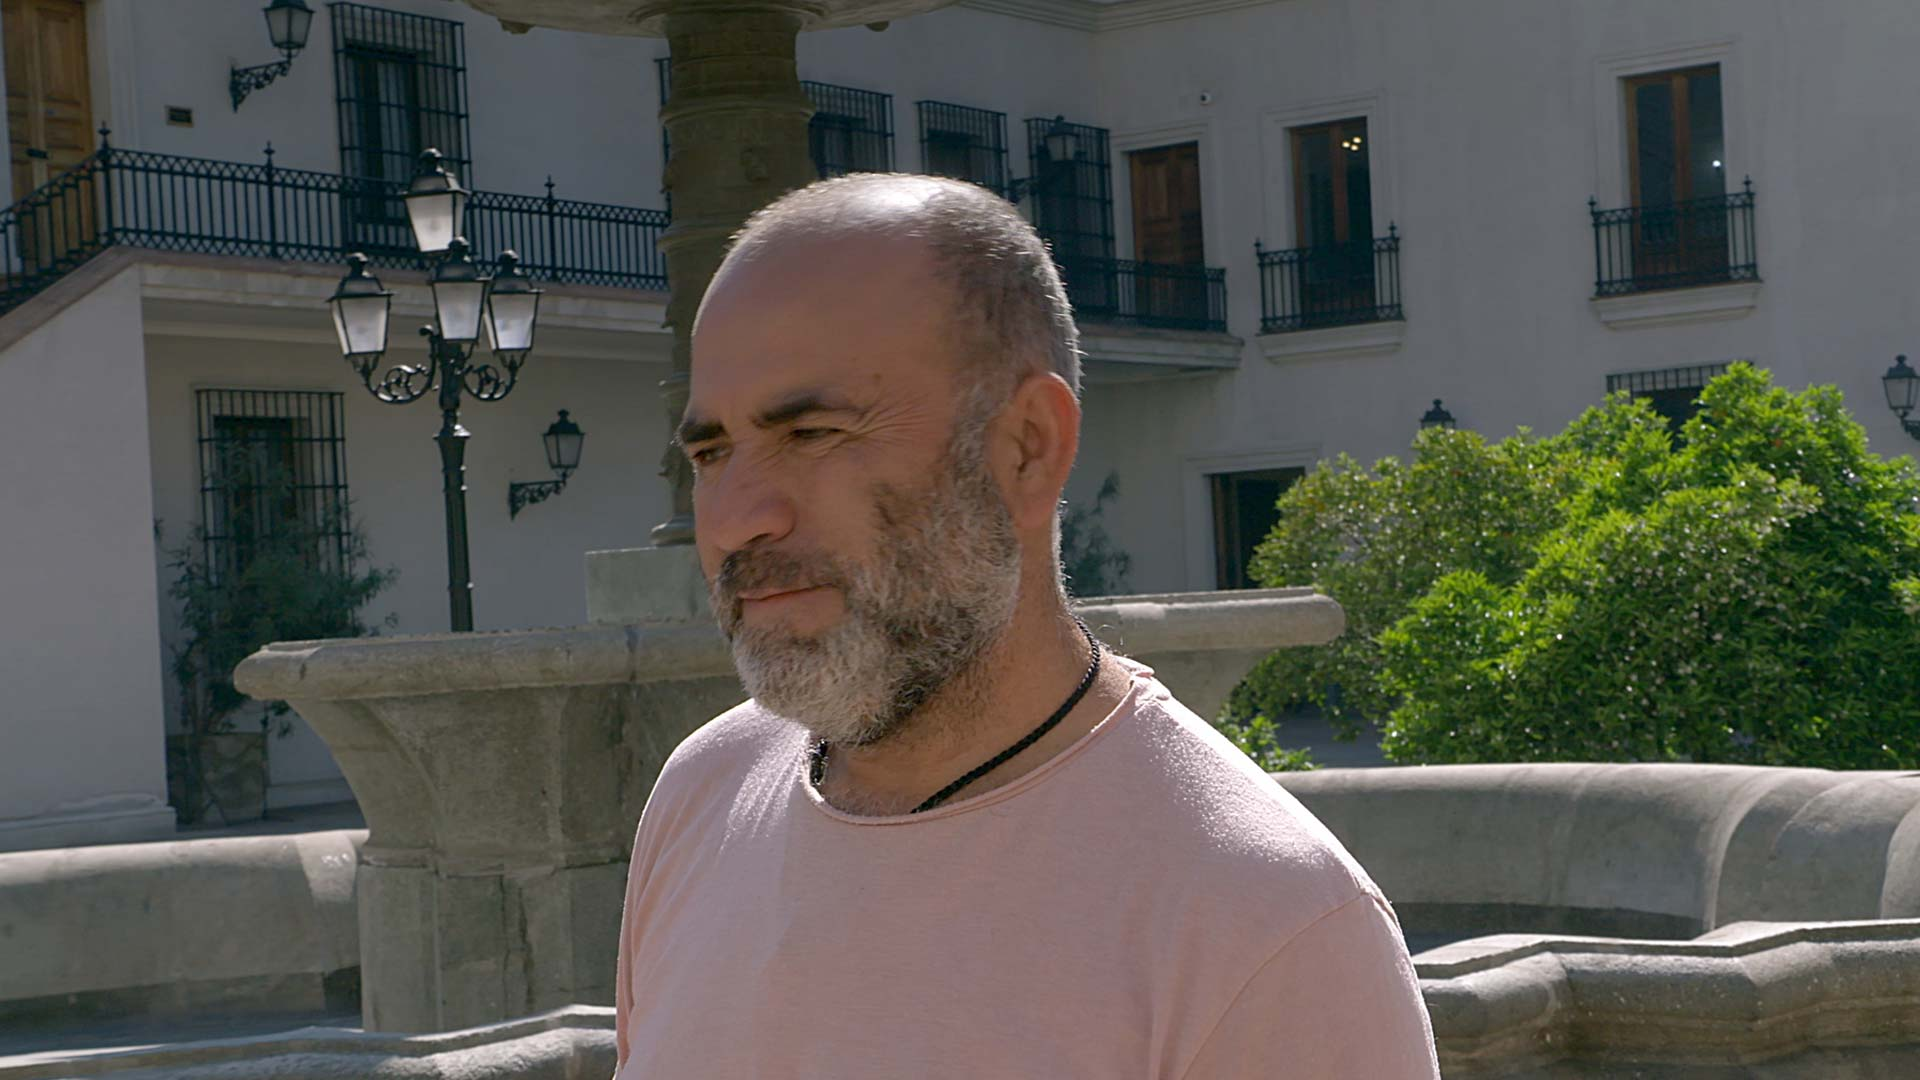 The Cordillera of Dreams Extra - Interview with Rolando Abarca - image